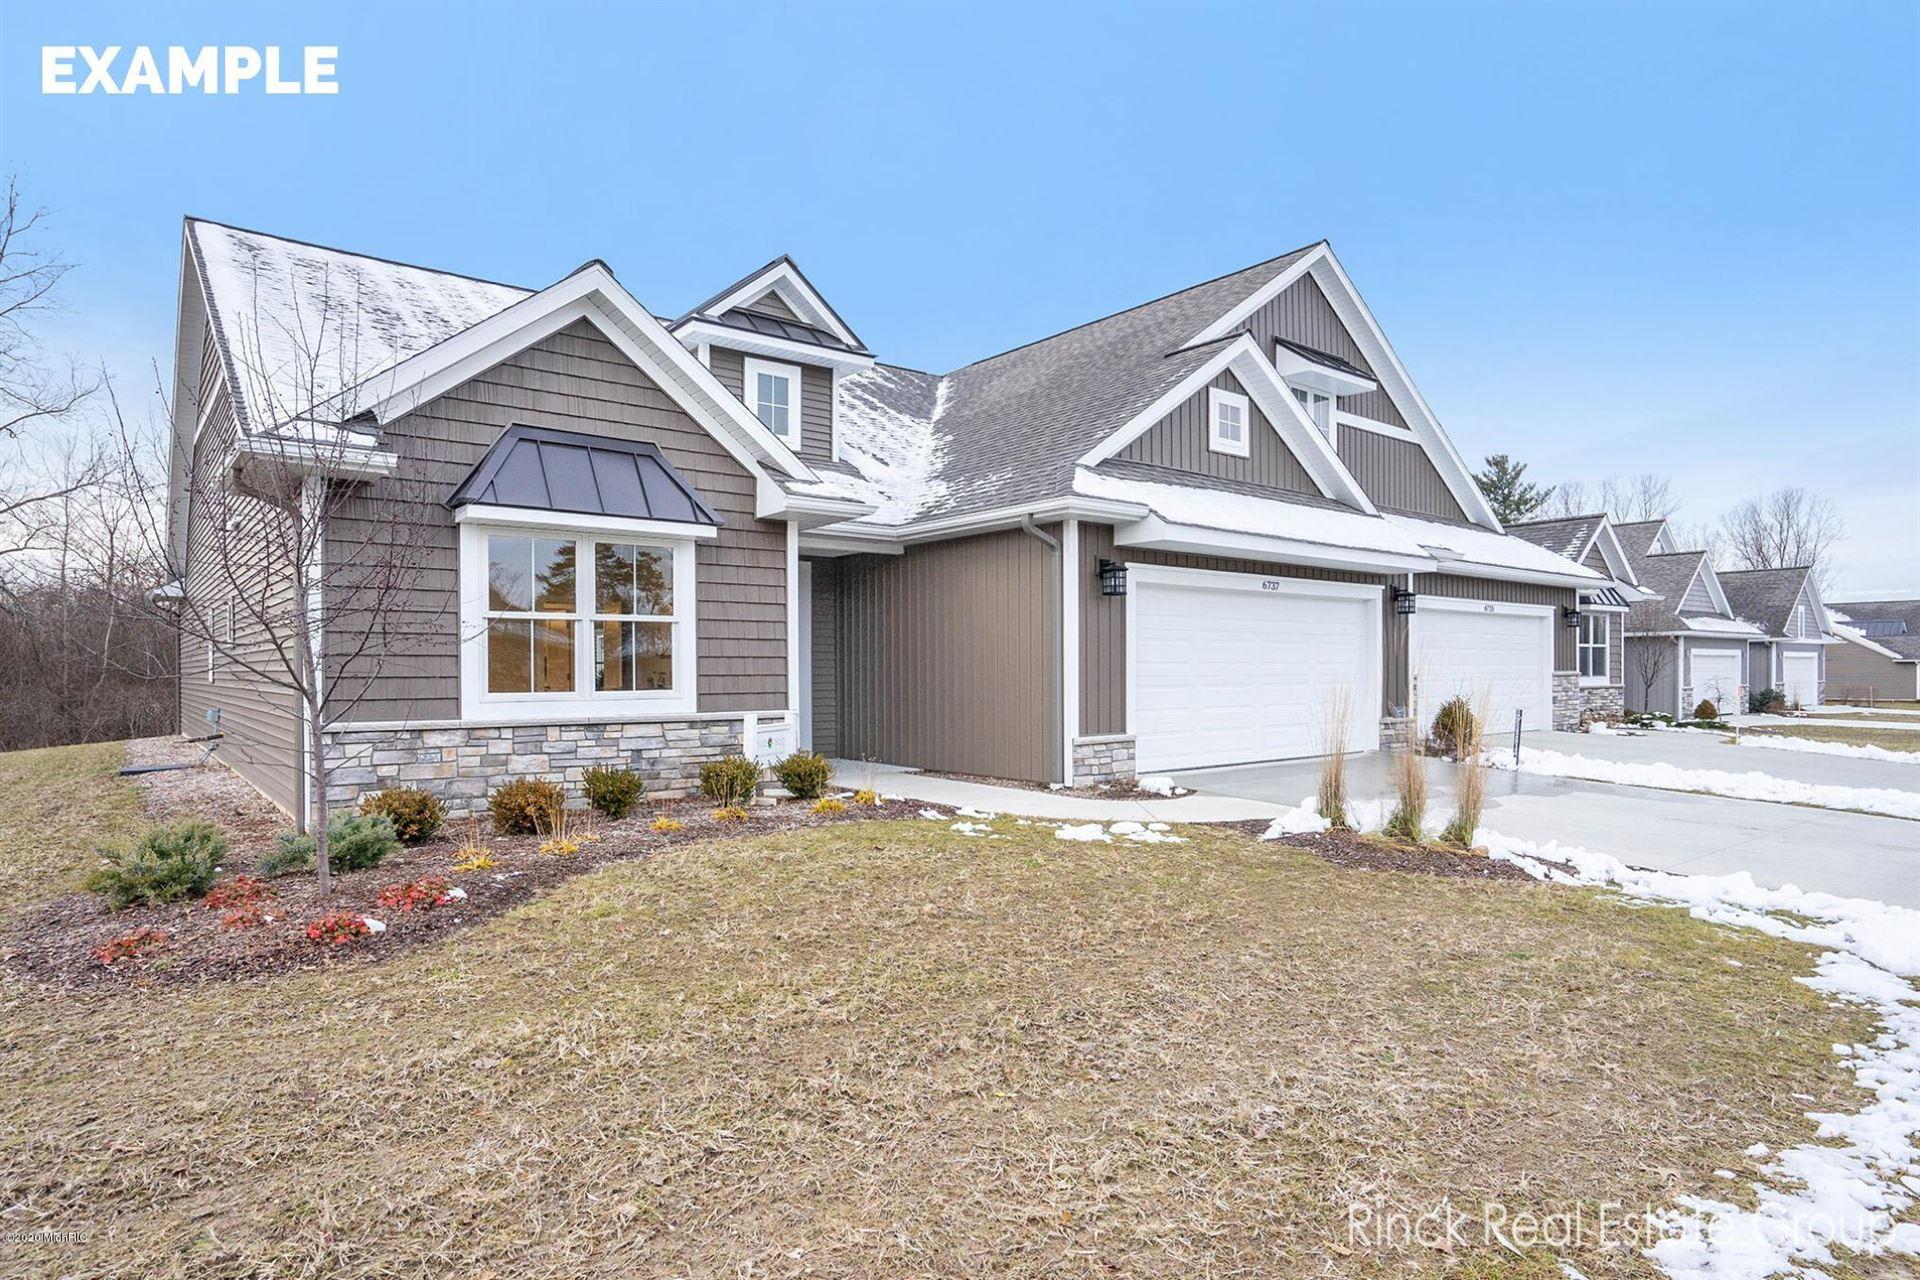 6673 Creekside View Drive SE #13, Grand Rapids, MI 49508 - #: 20013964